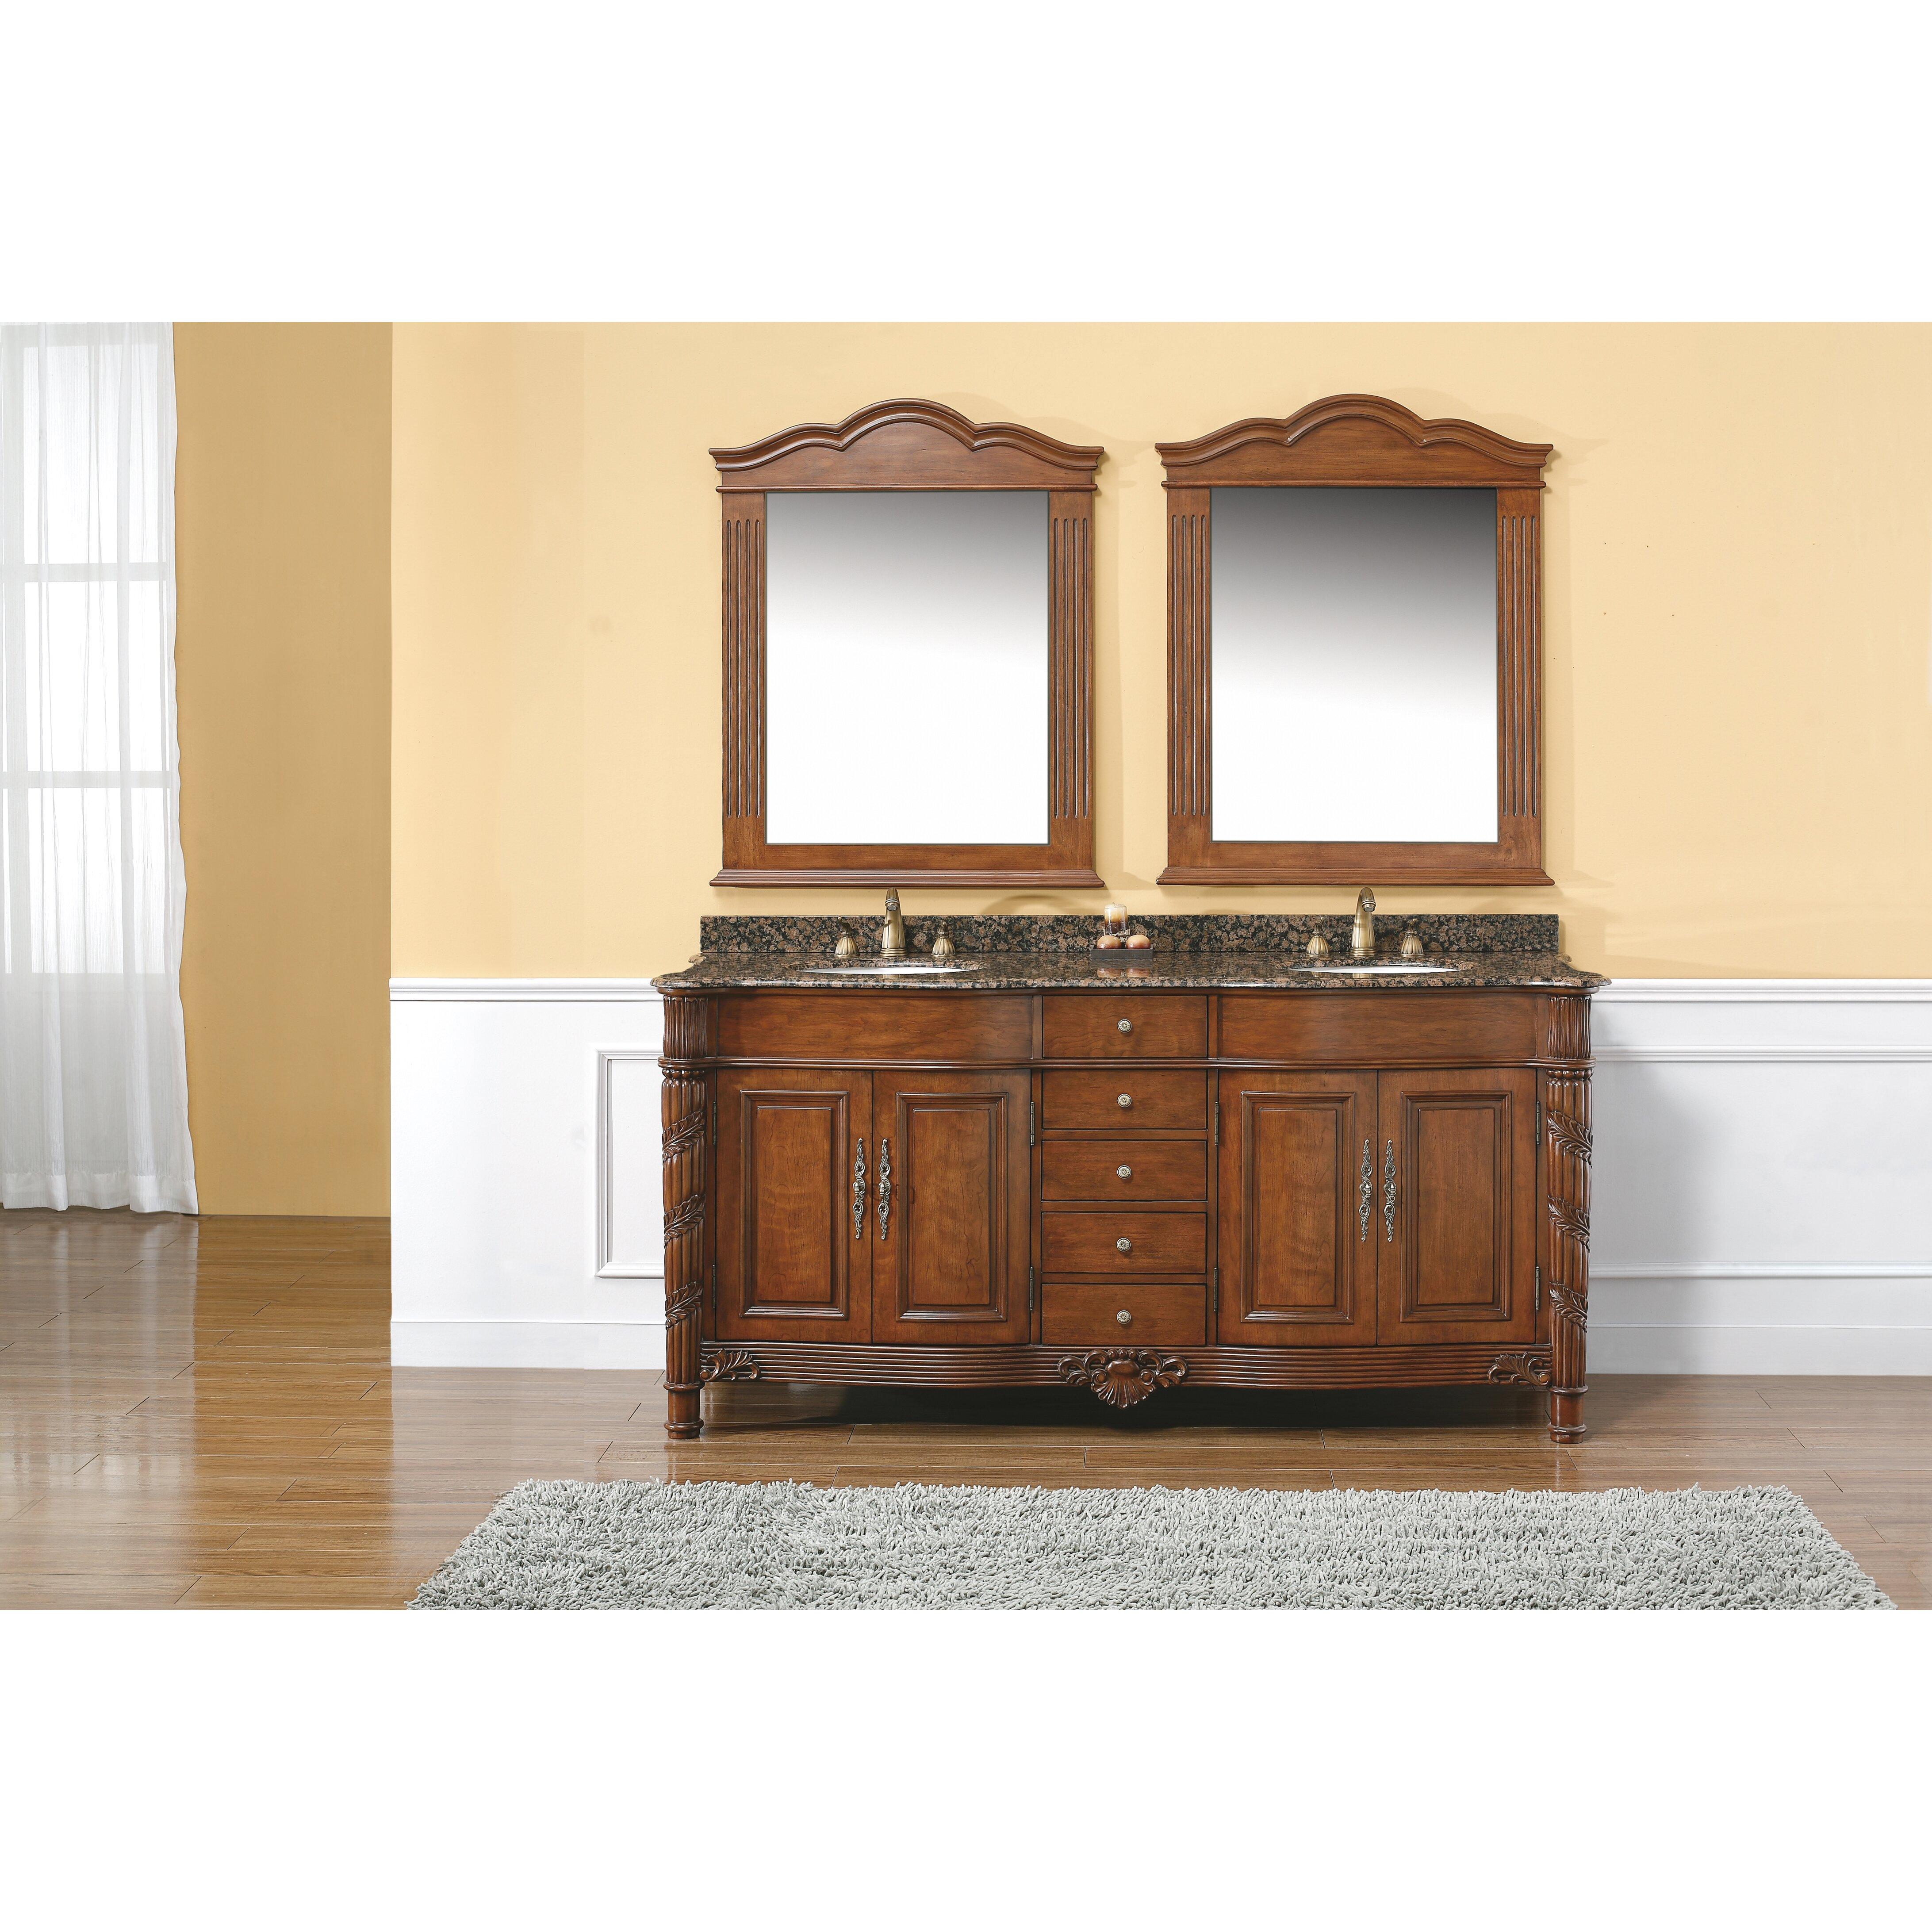 James martin furniture dalia 72 double cherry bathroom vanity set with drawers reviews wayfair for Cherry bathroom vanity